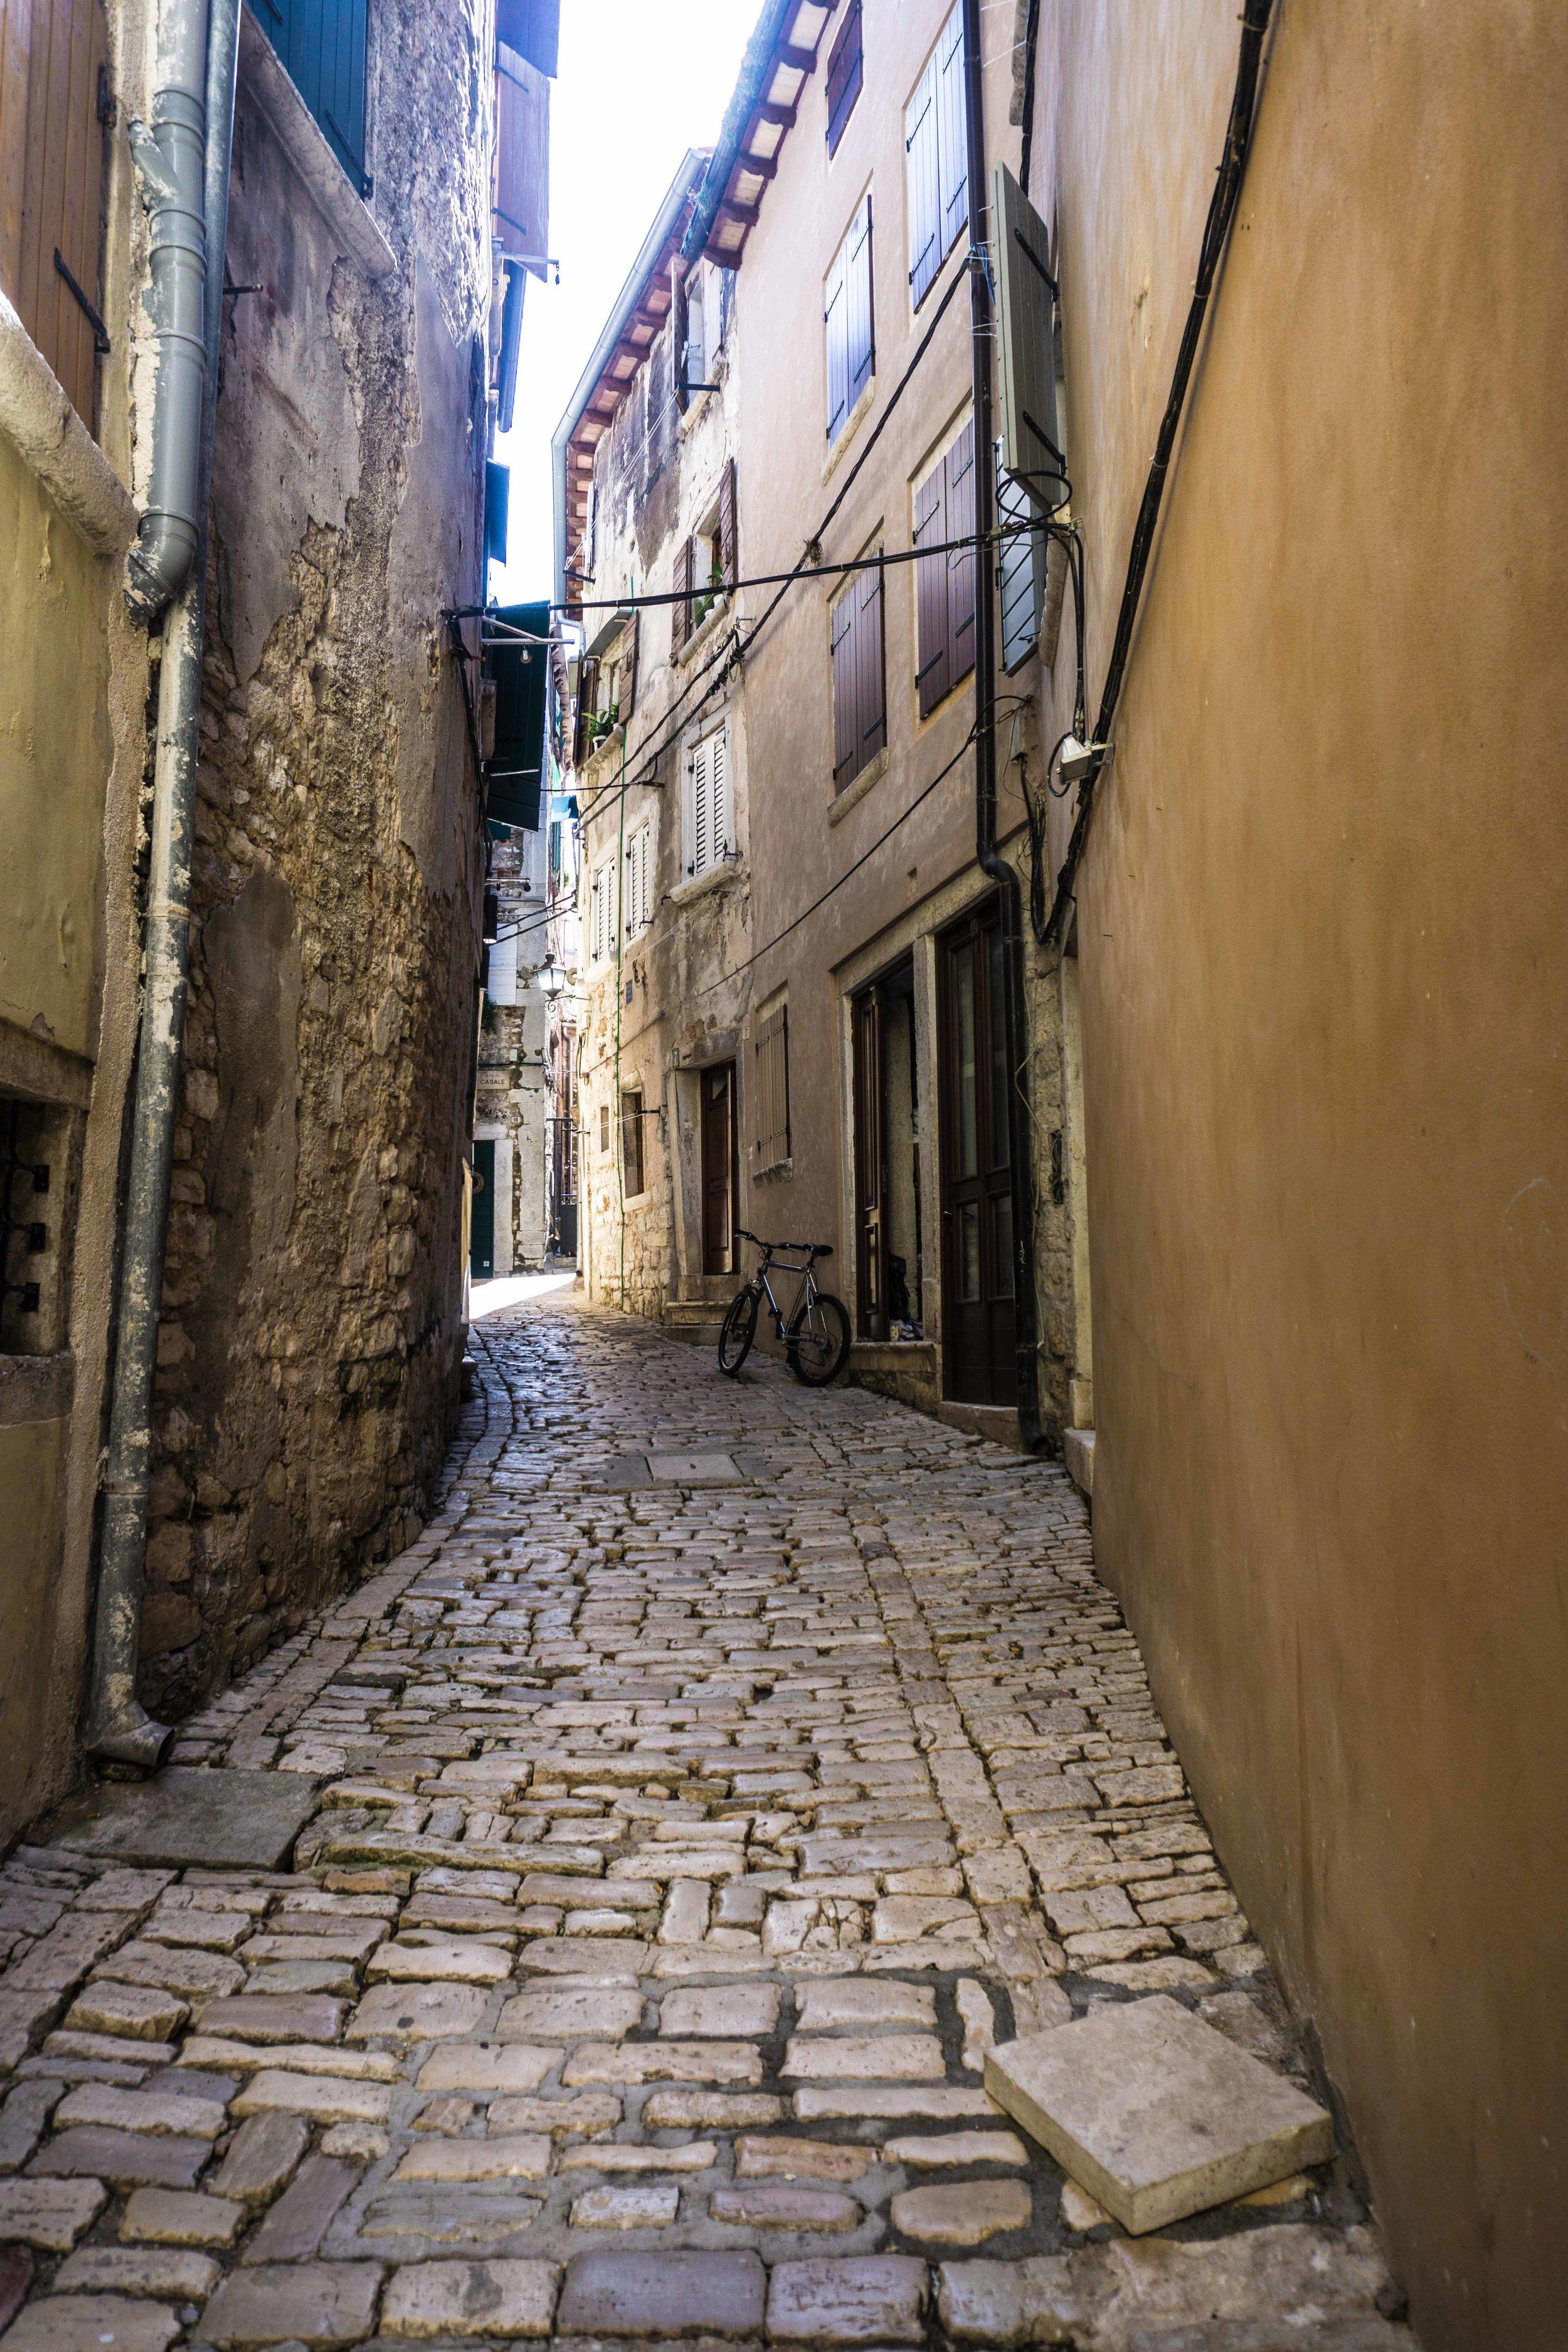 Uphill streets of Rovinj